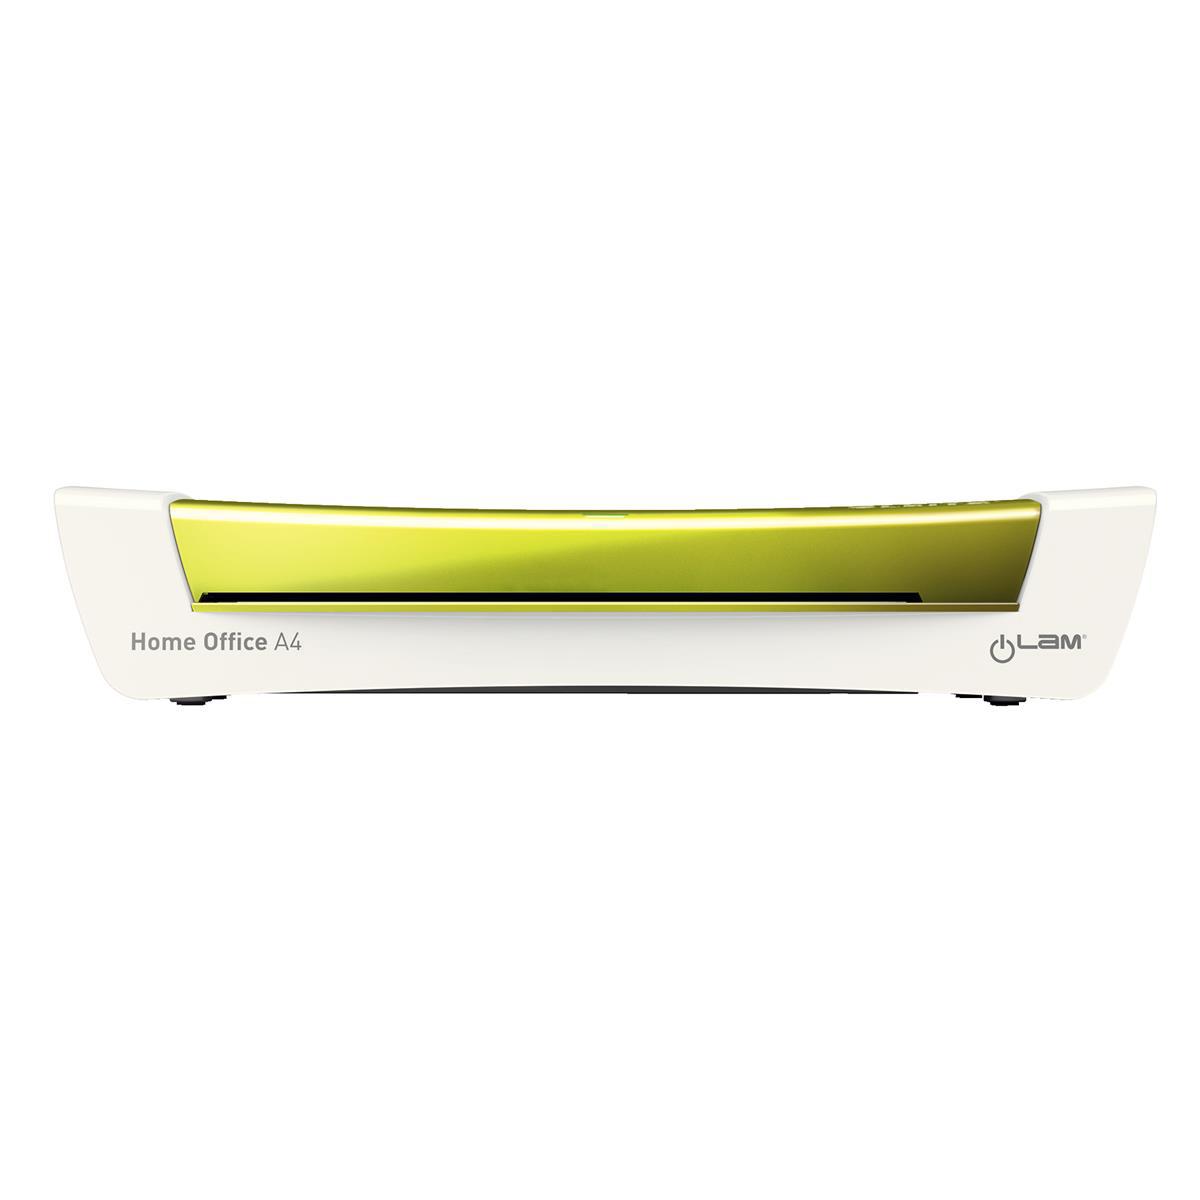 Leitz iLam Home Office Laminator A4 Green Ref 73681064